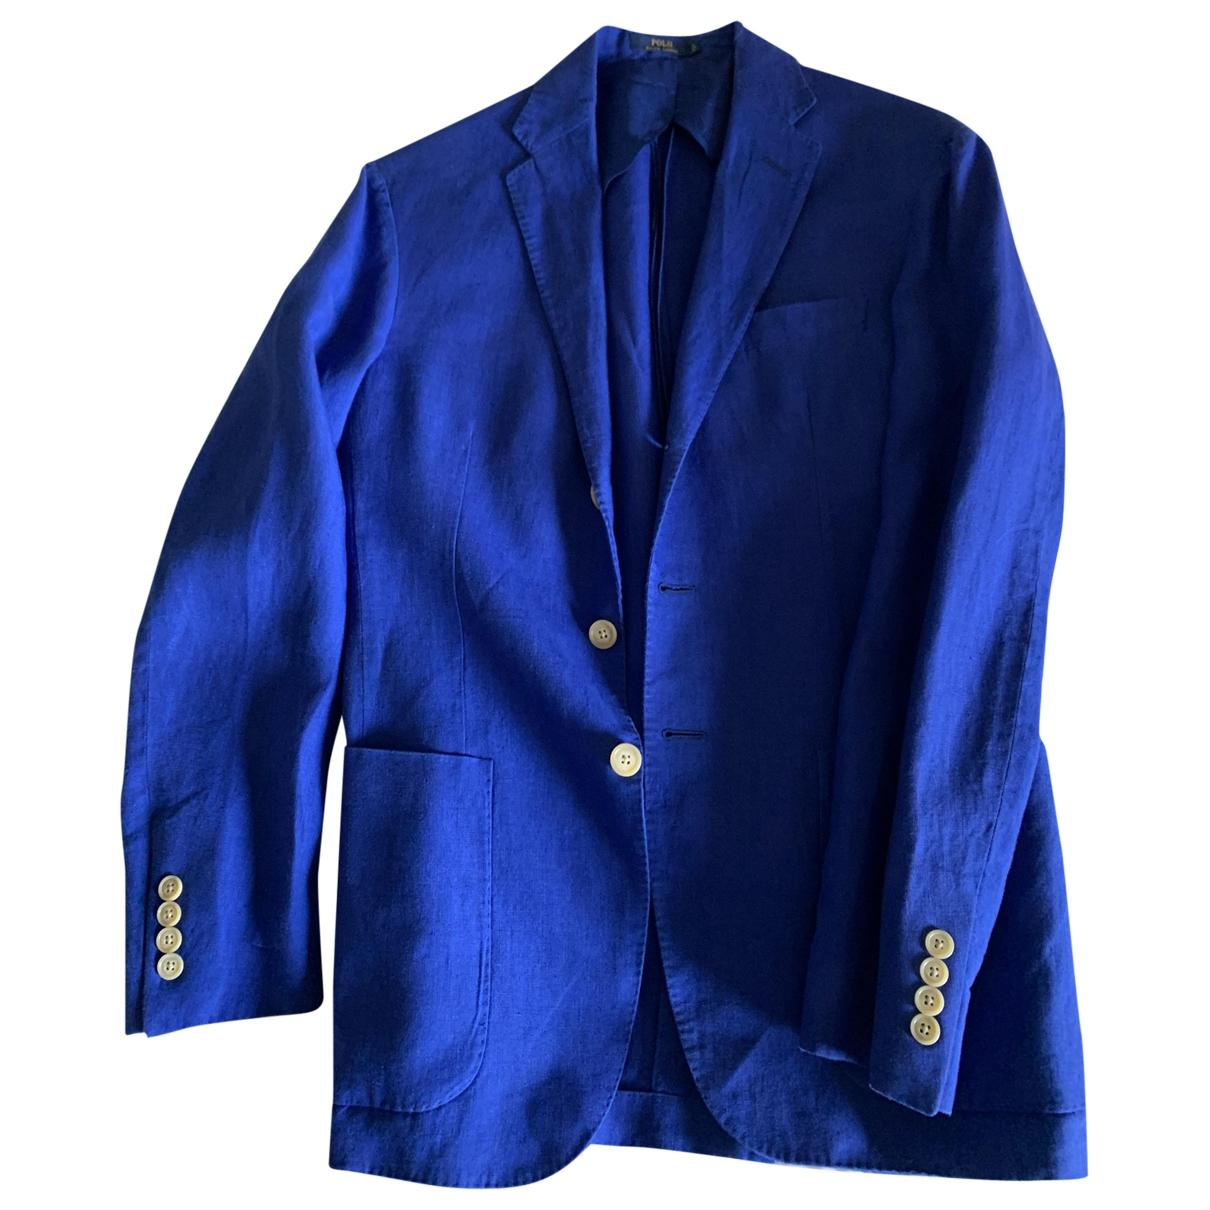 Polo Ralph Lauren \N Blue Linen jacket  for Men S International